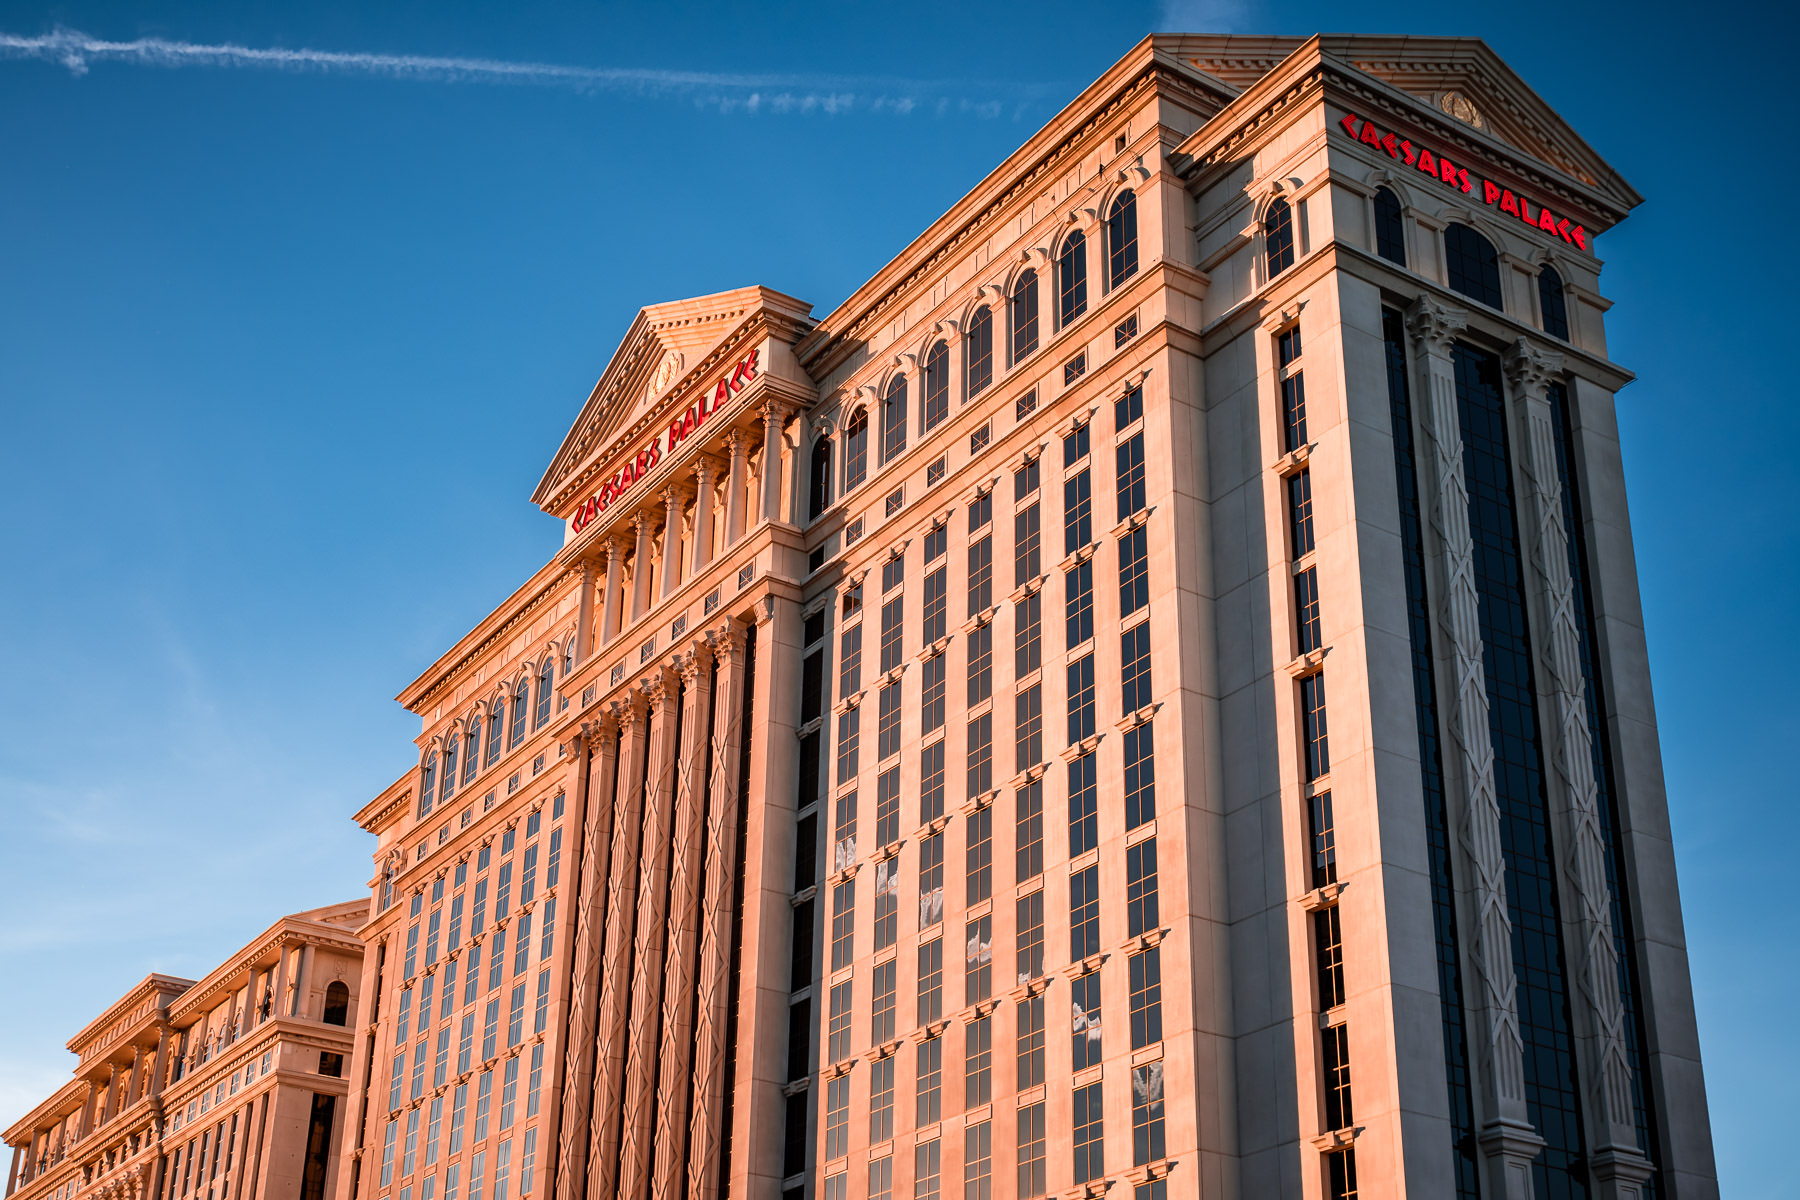 Caesars Palace's Augustus Tower rises into the early-evening Las Vegas sky.